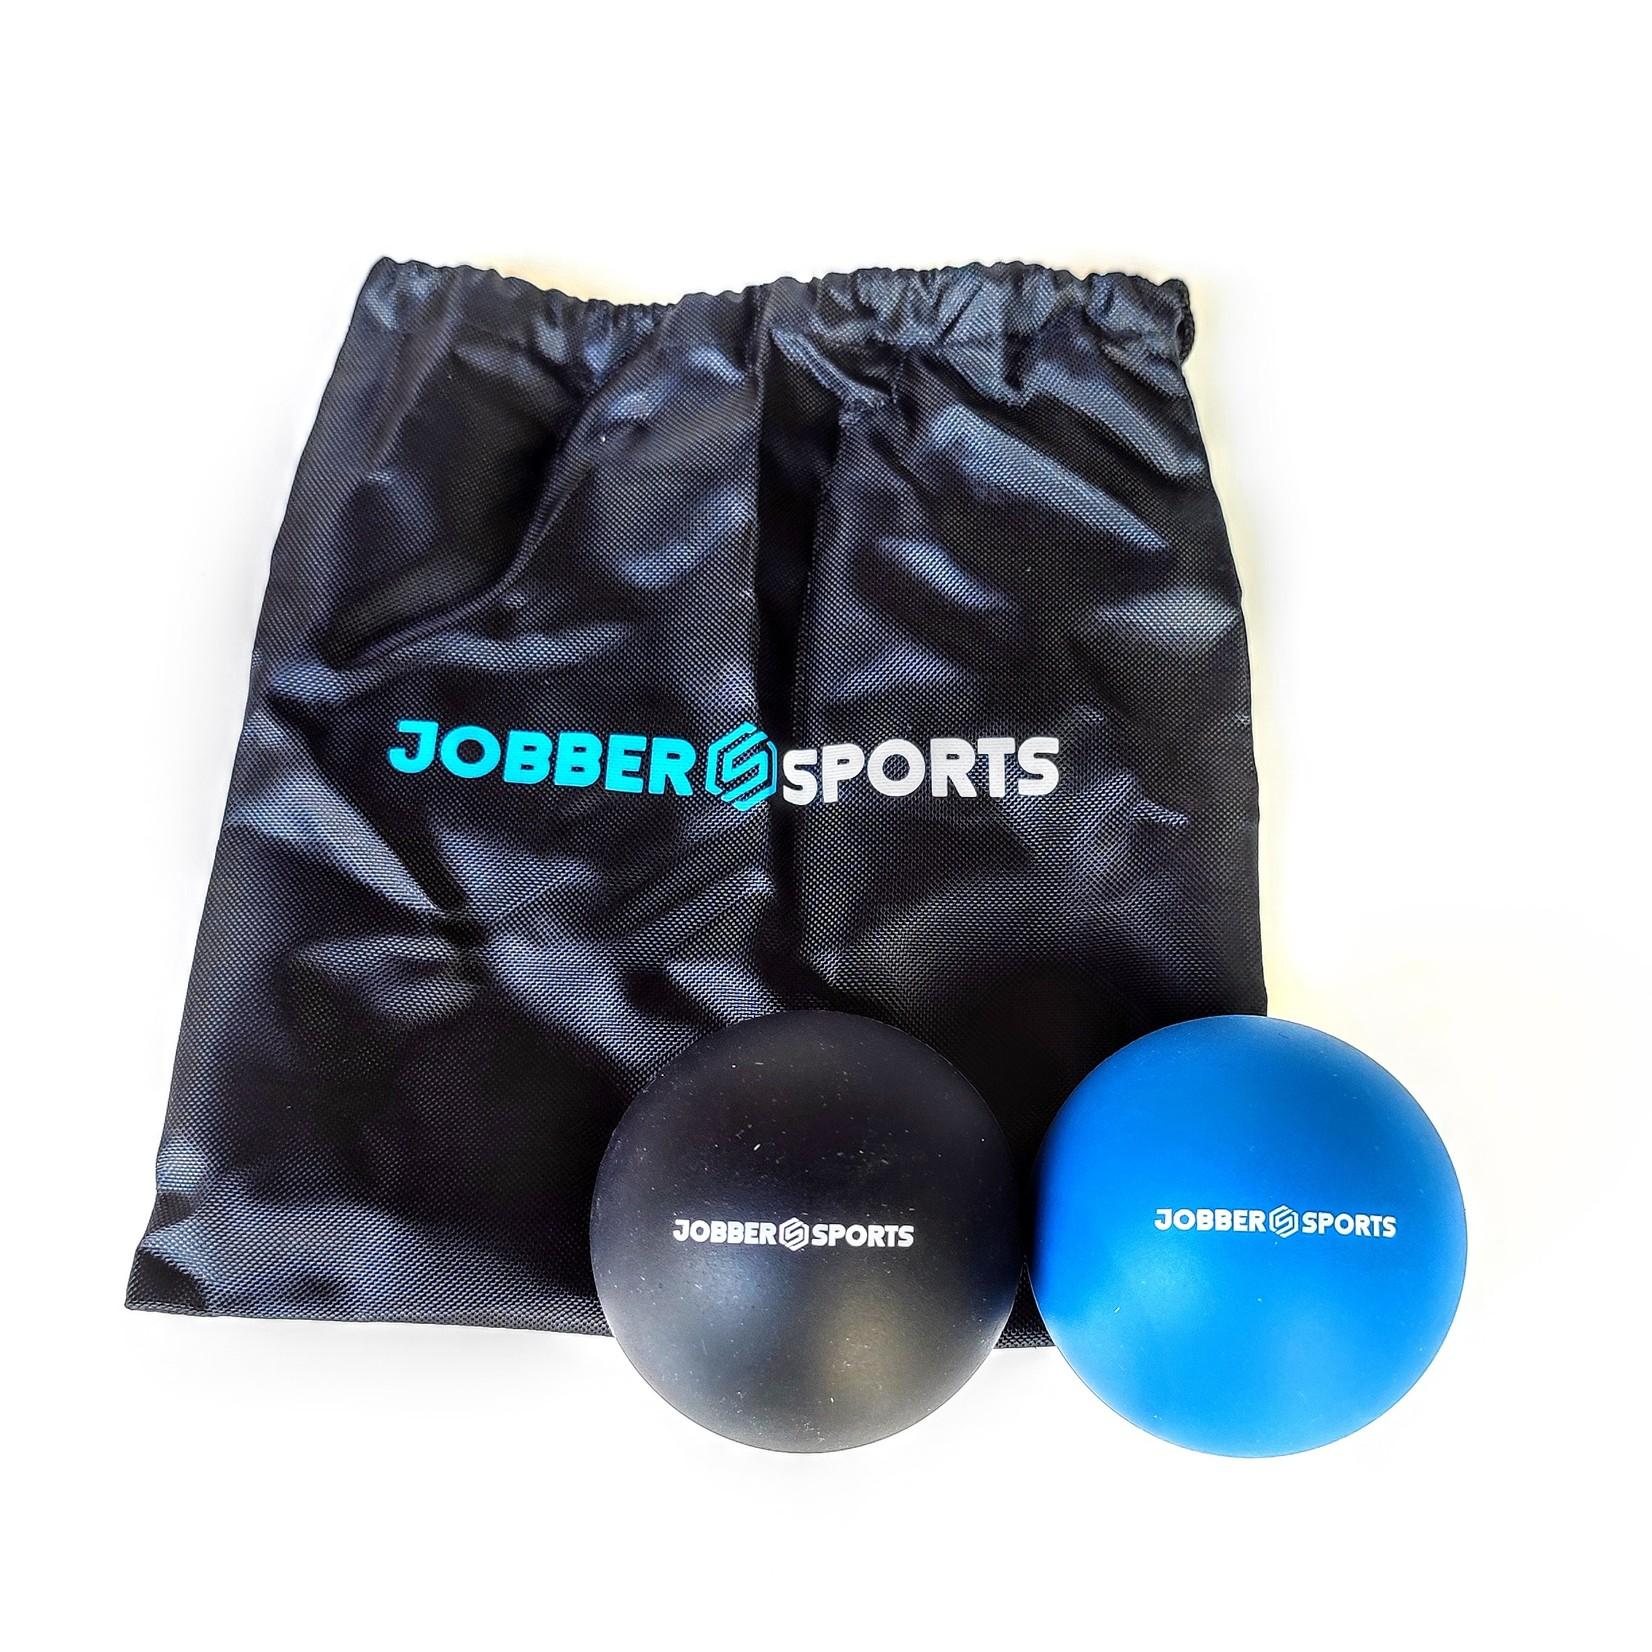 Jobber Sports Jobber Sports Fitness set - 2x Massage bal & Springtouw Twister 1.0